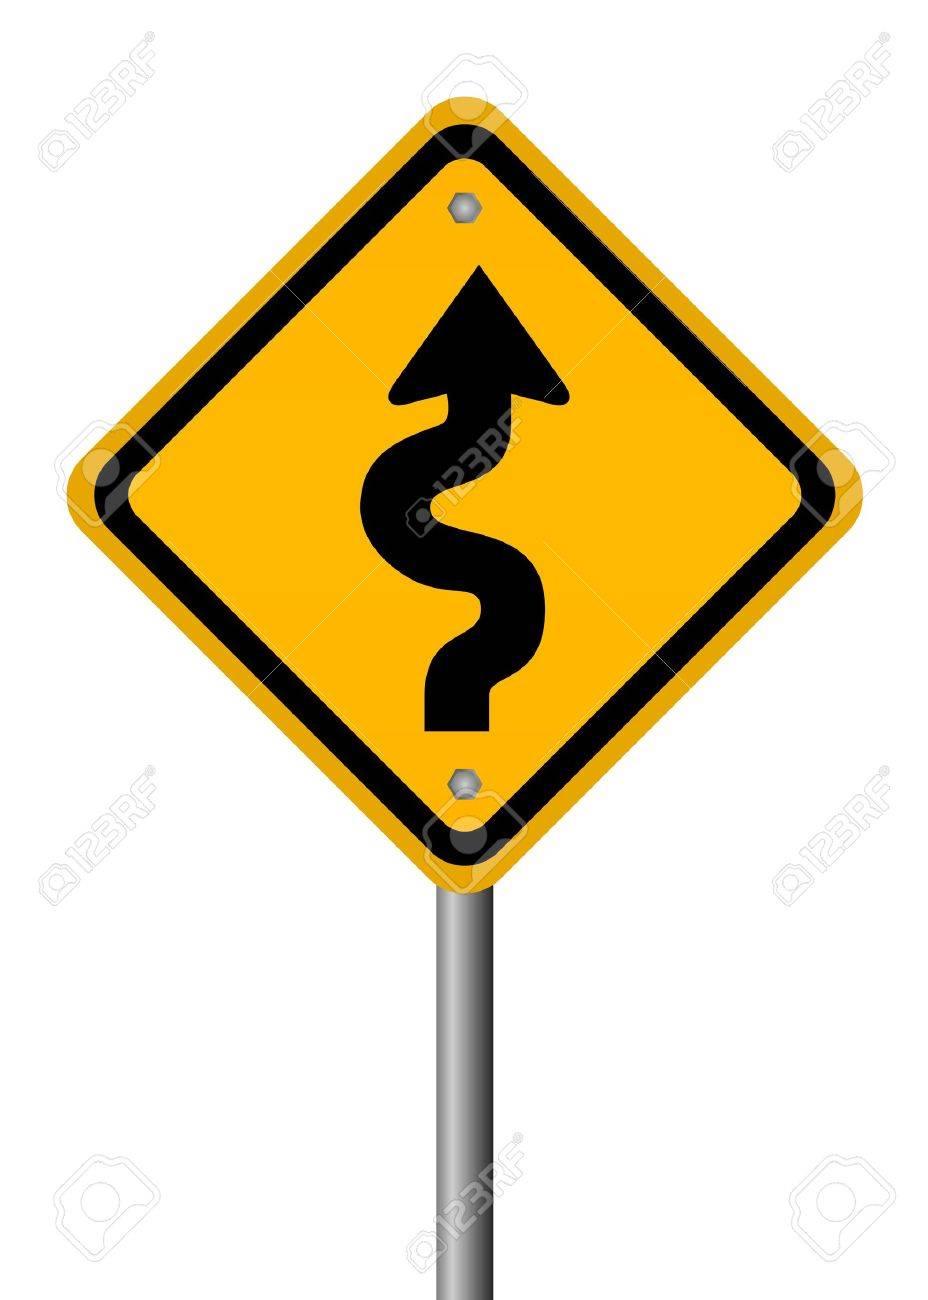 Curvy road sign Stock Photo - 9396072